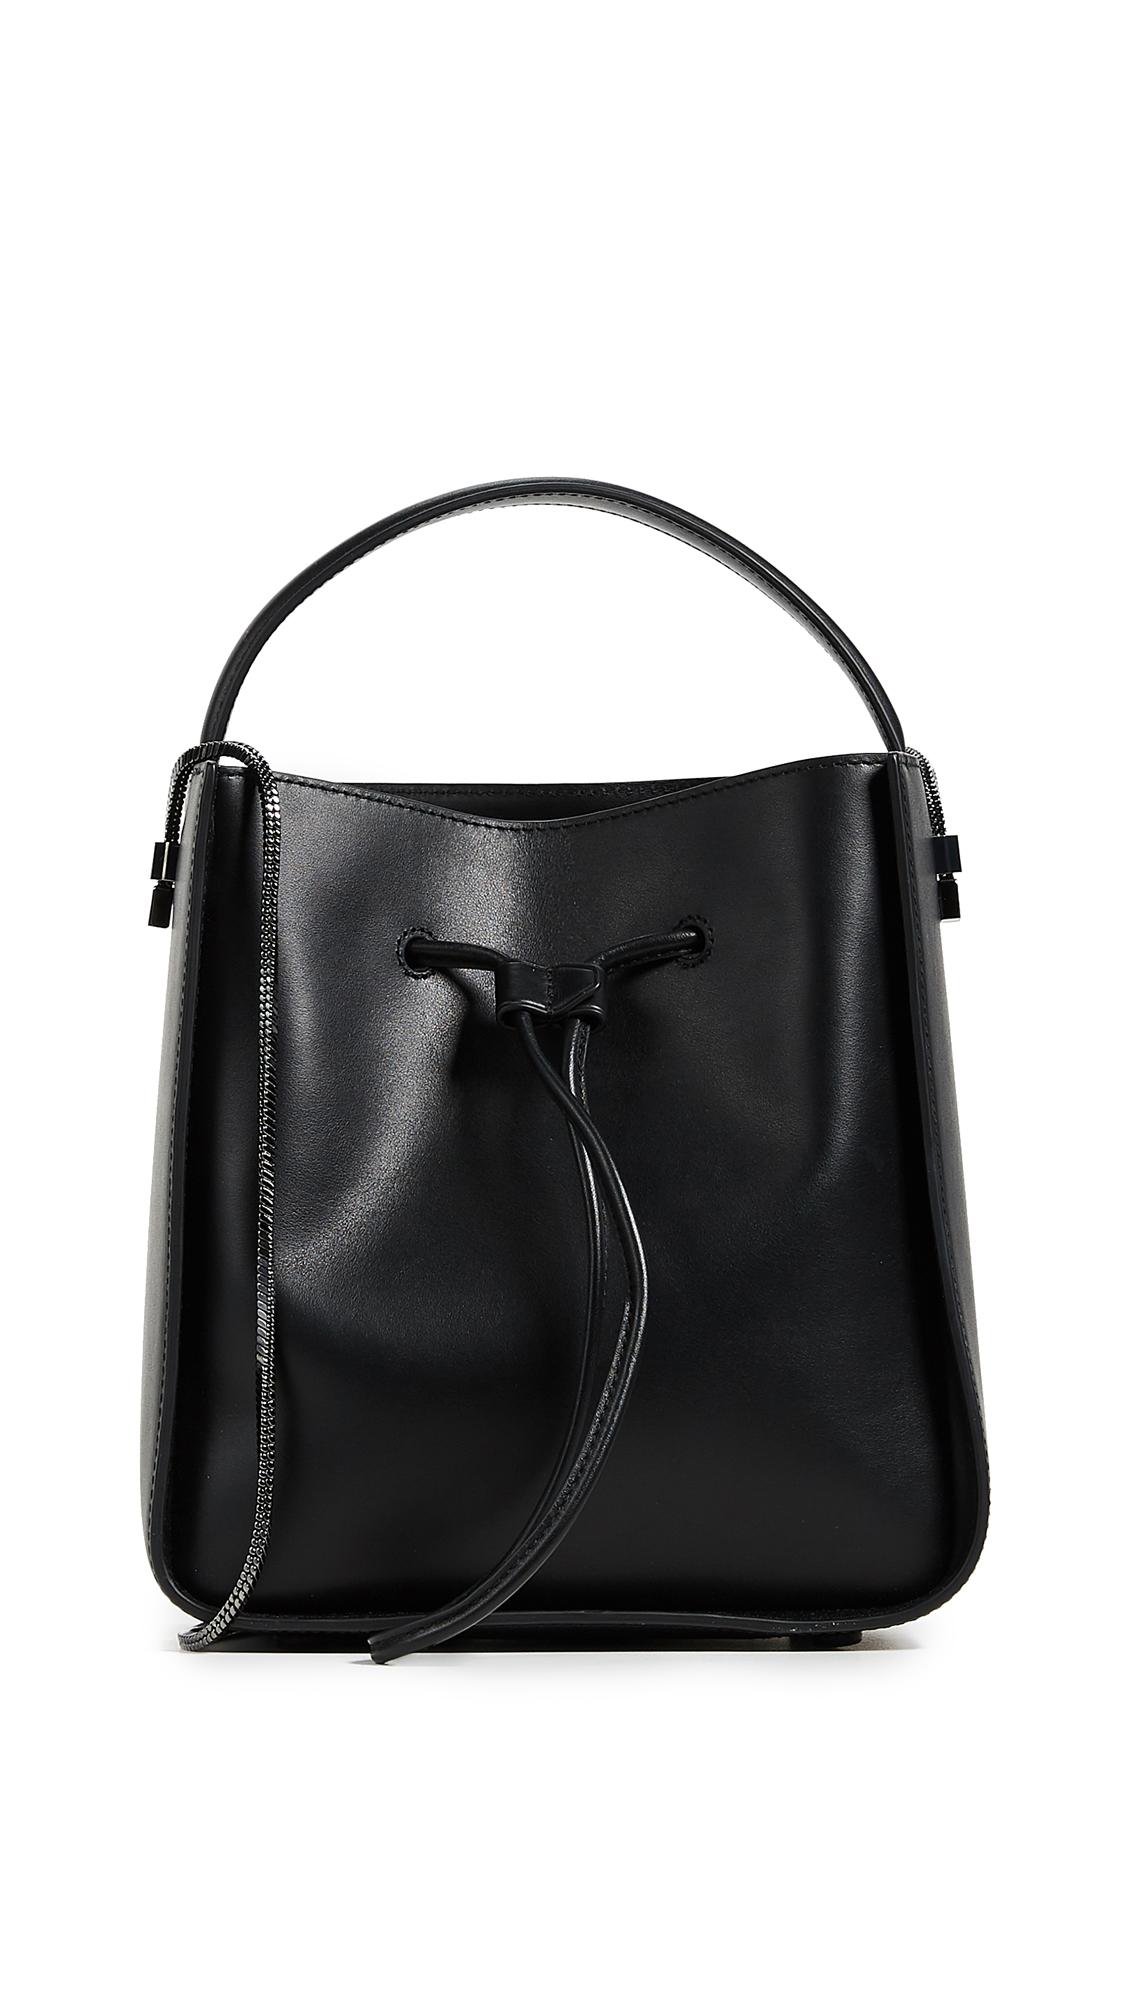 3.1 Phillip Lim Soleil Small Bucket Bag - Black